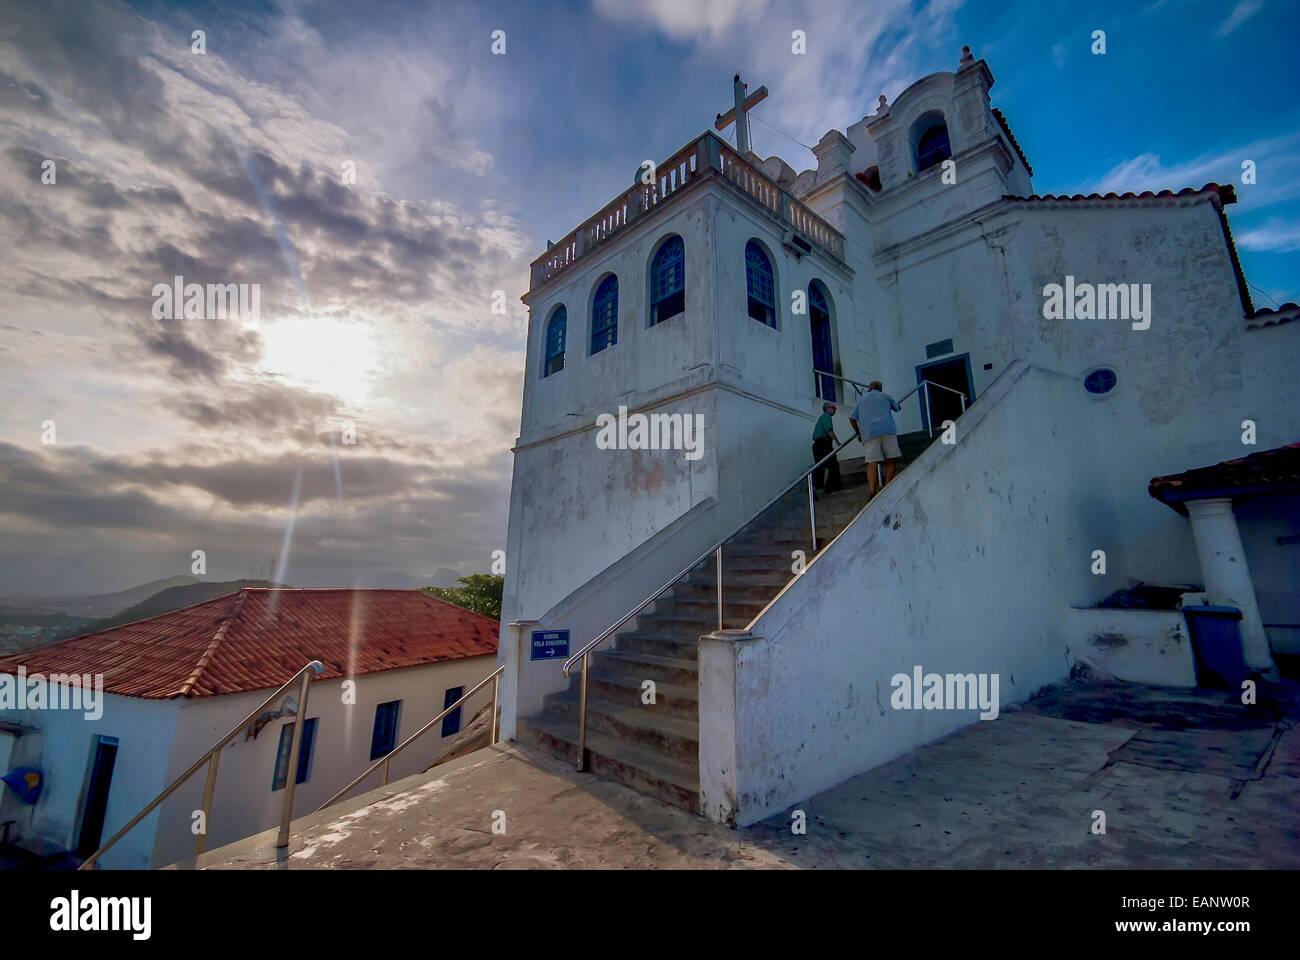 Preregrinos, de manhã cedo, sobem as escadas do Convento da Penha / Pilgrims, early morning, climb the stairs - Stock Image